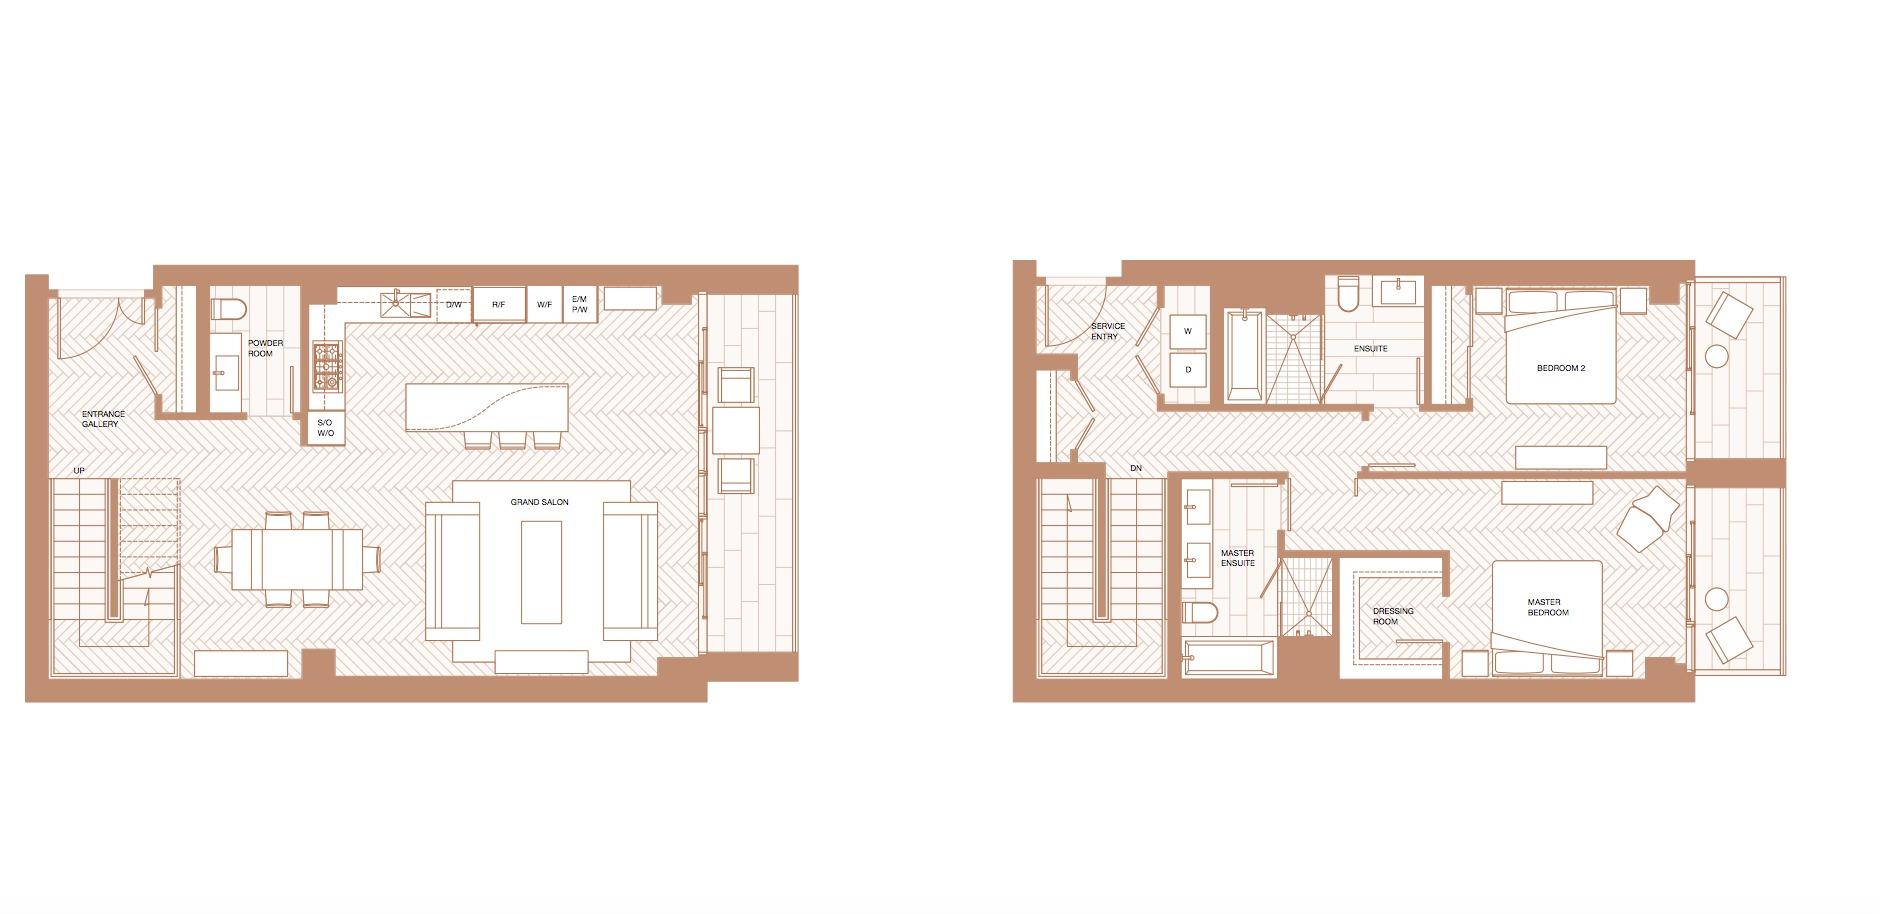 VancouverHouse Penthouse 9_Floorplan